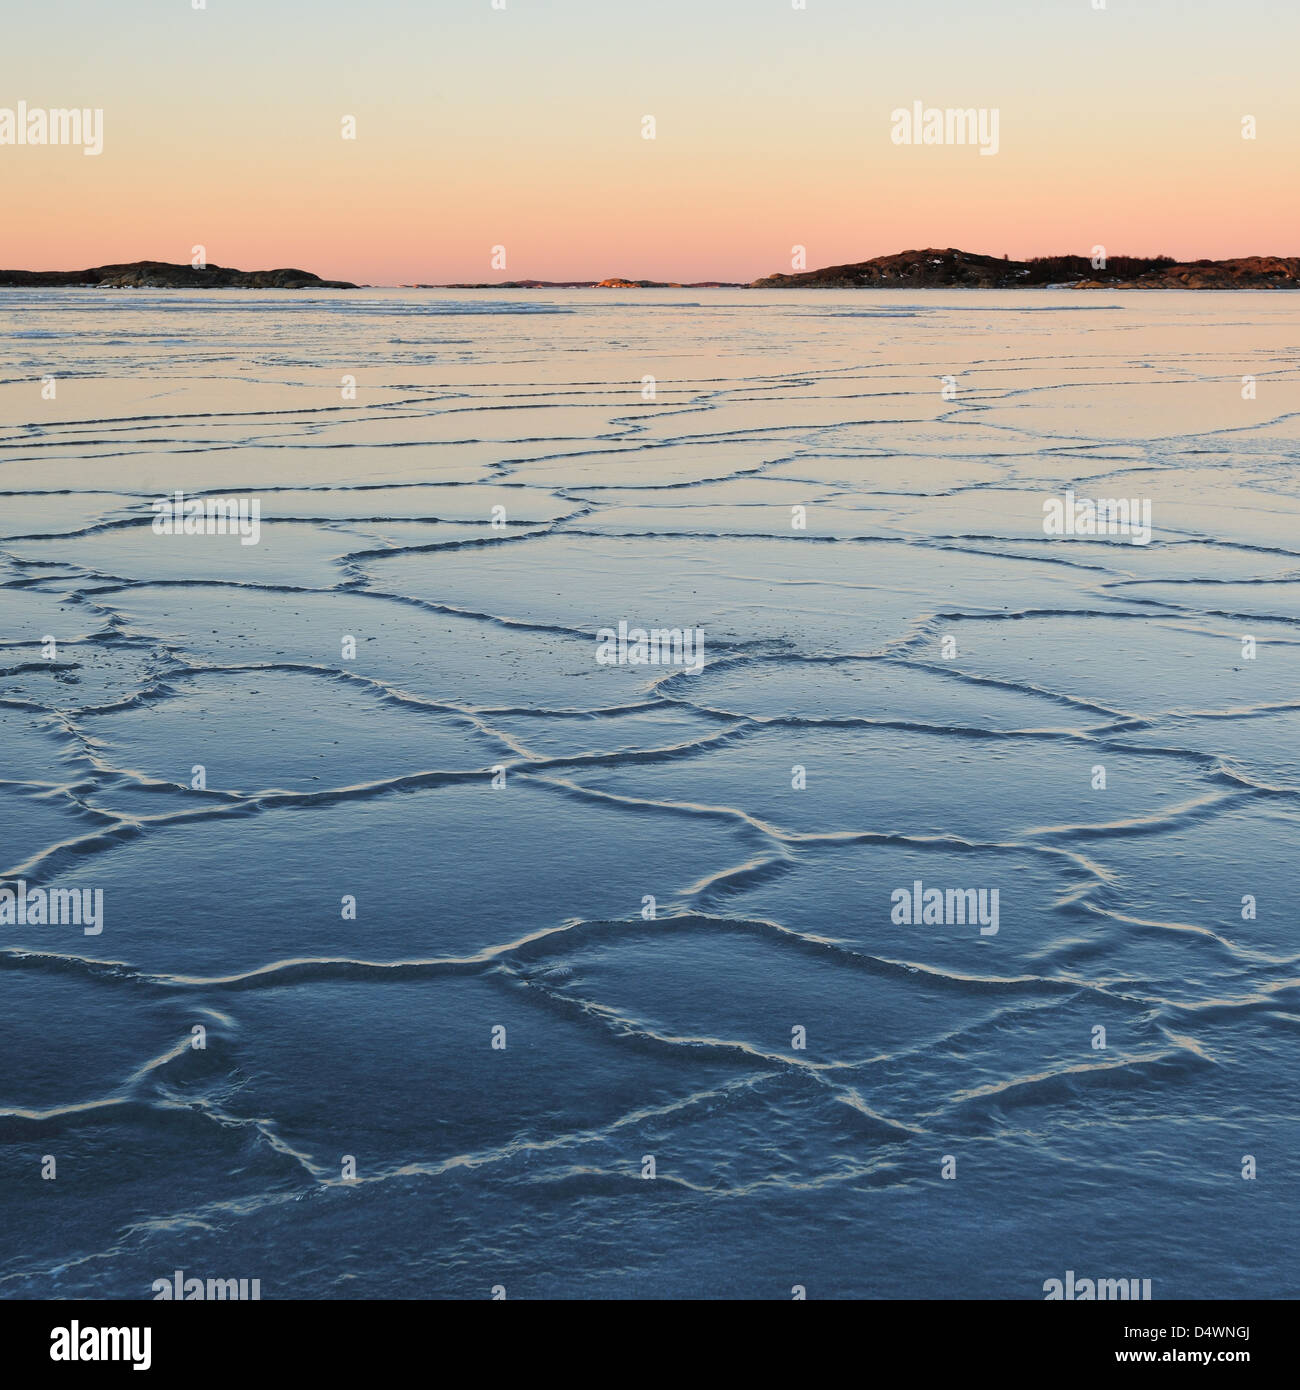 Gefrorene Meer bei Smithska Udden, Bialistok, Schweden, Europa Stockbild